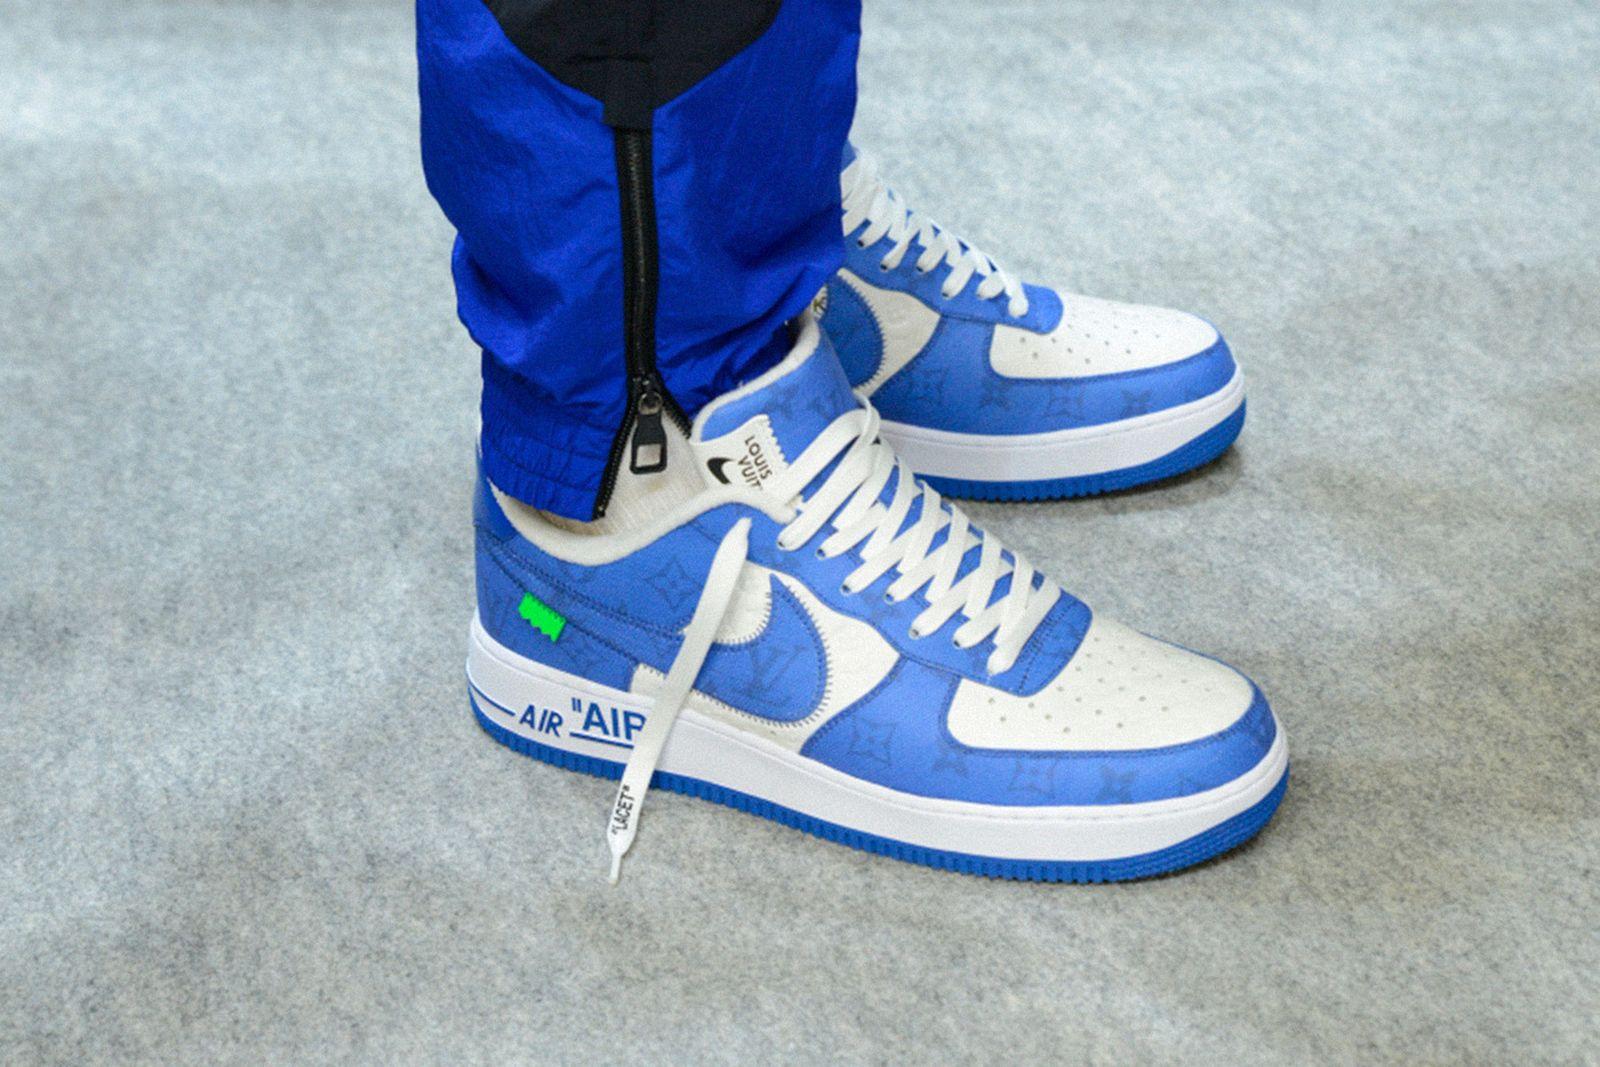 louis-vuitton-nike-virgil-abloh-sneaker-reveal-03